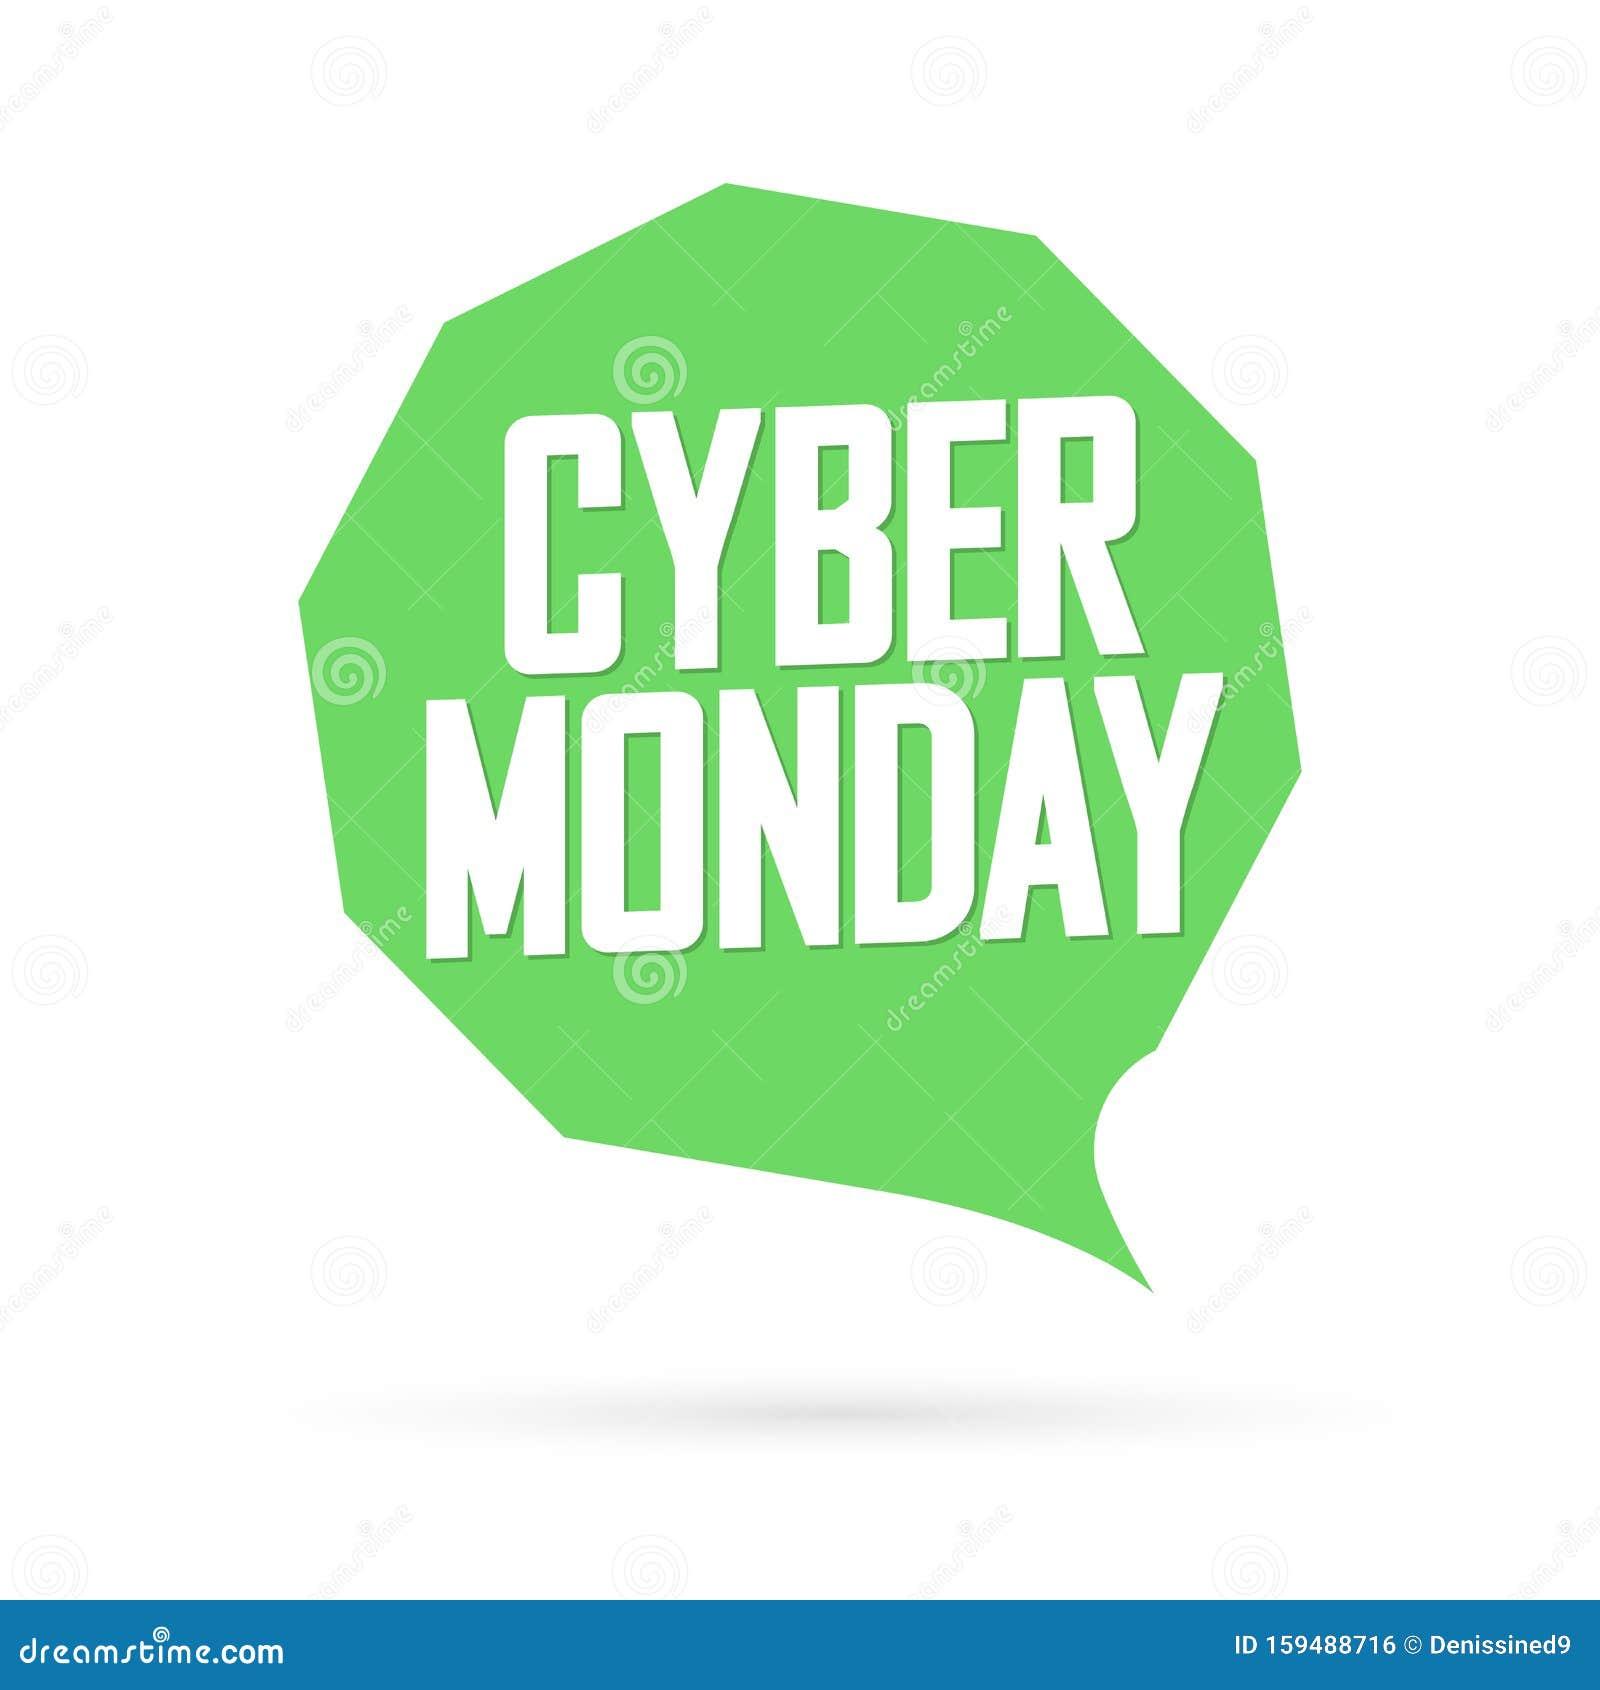 Cyber Monday, Sale Speech Bubble Banner Design Template